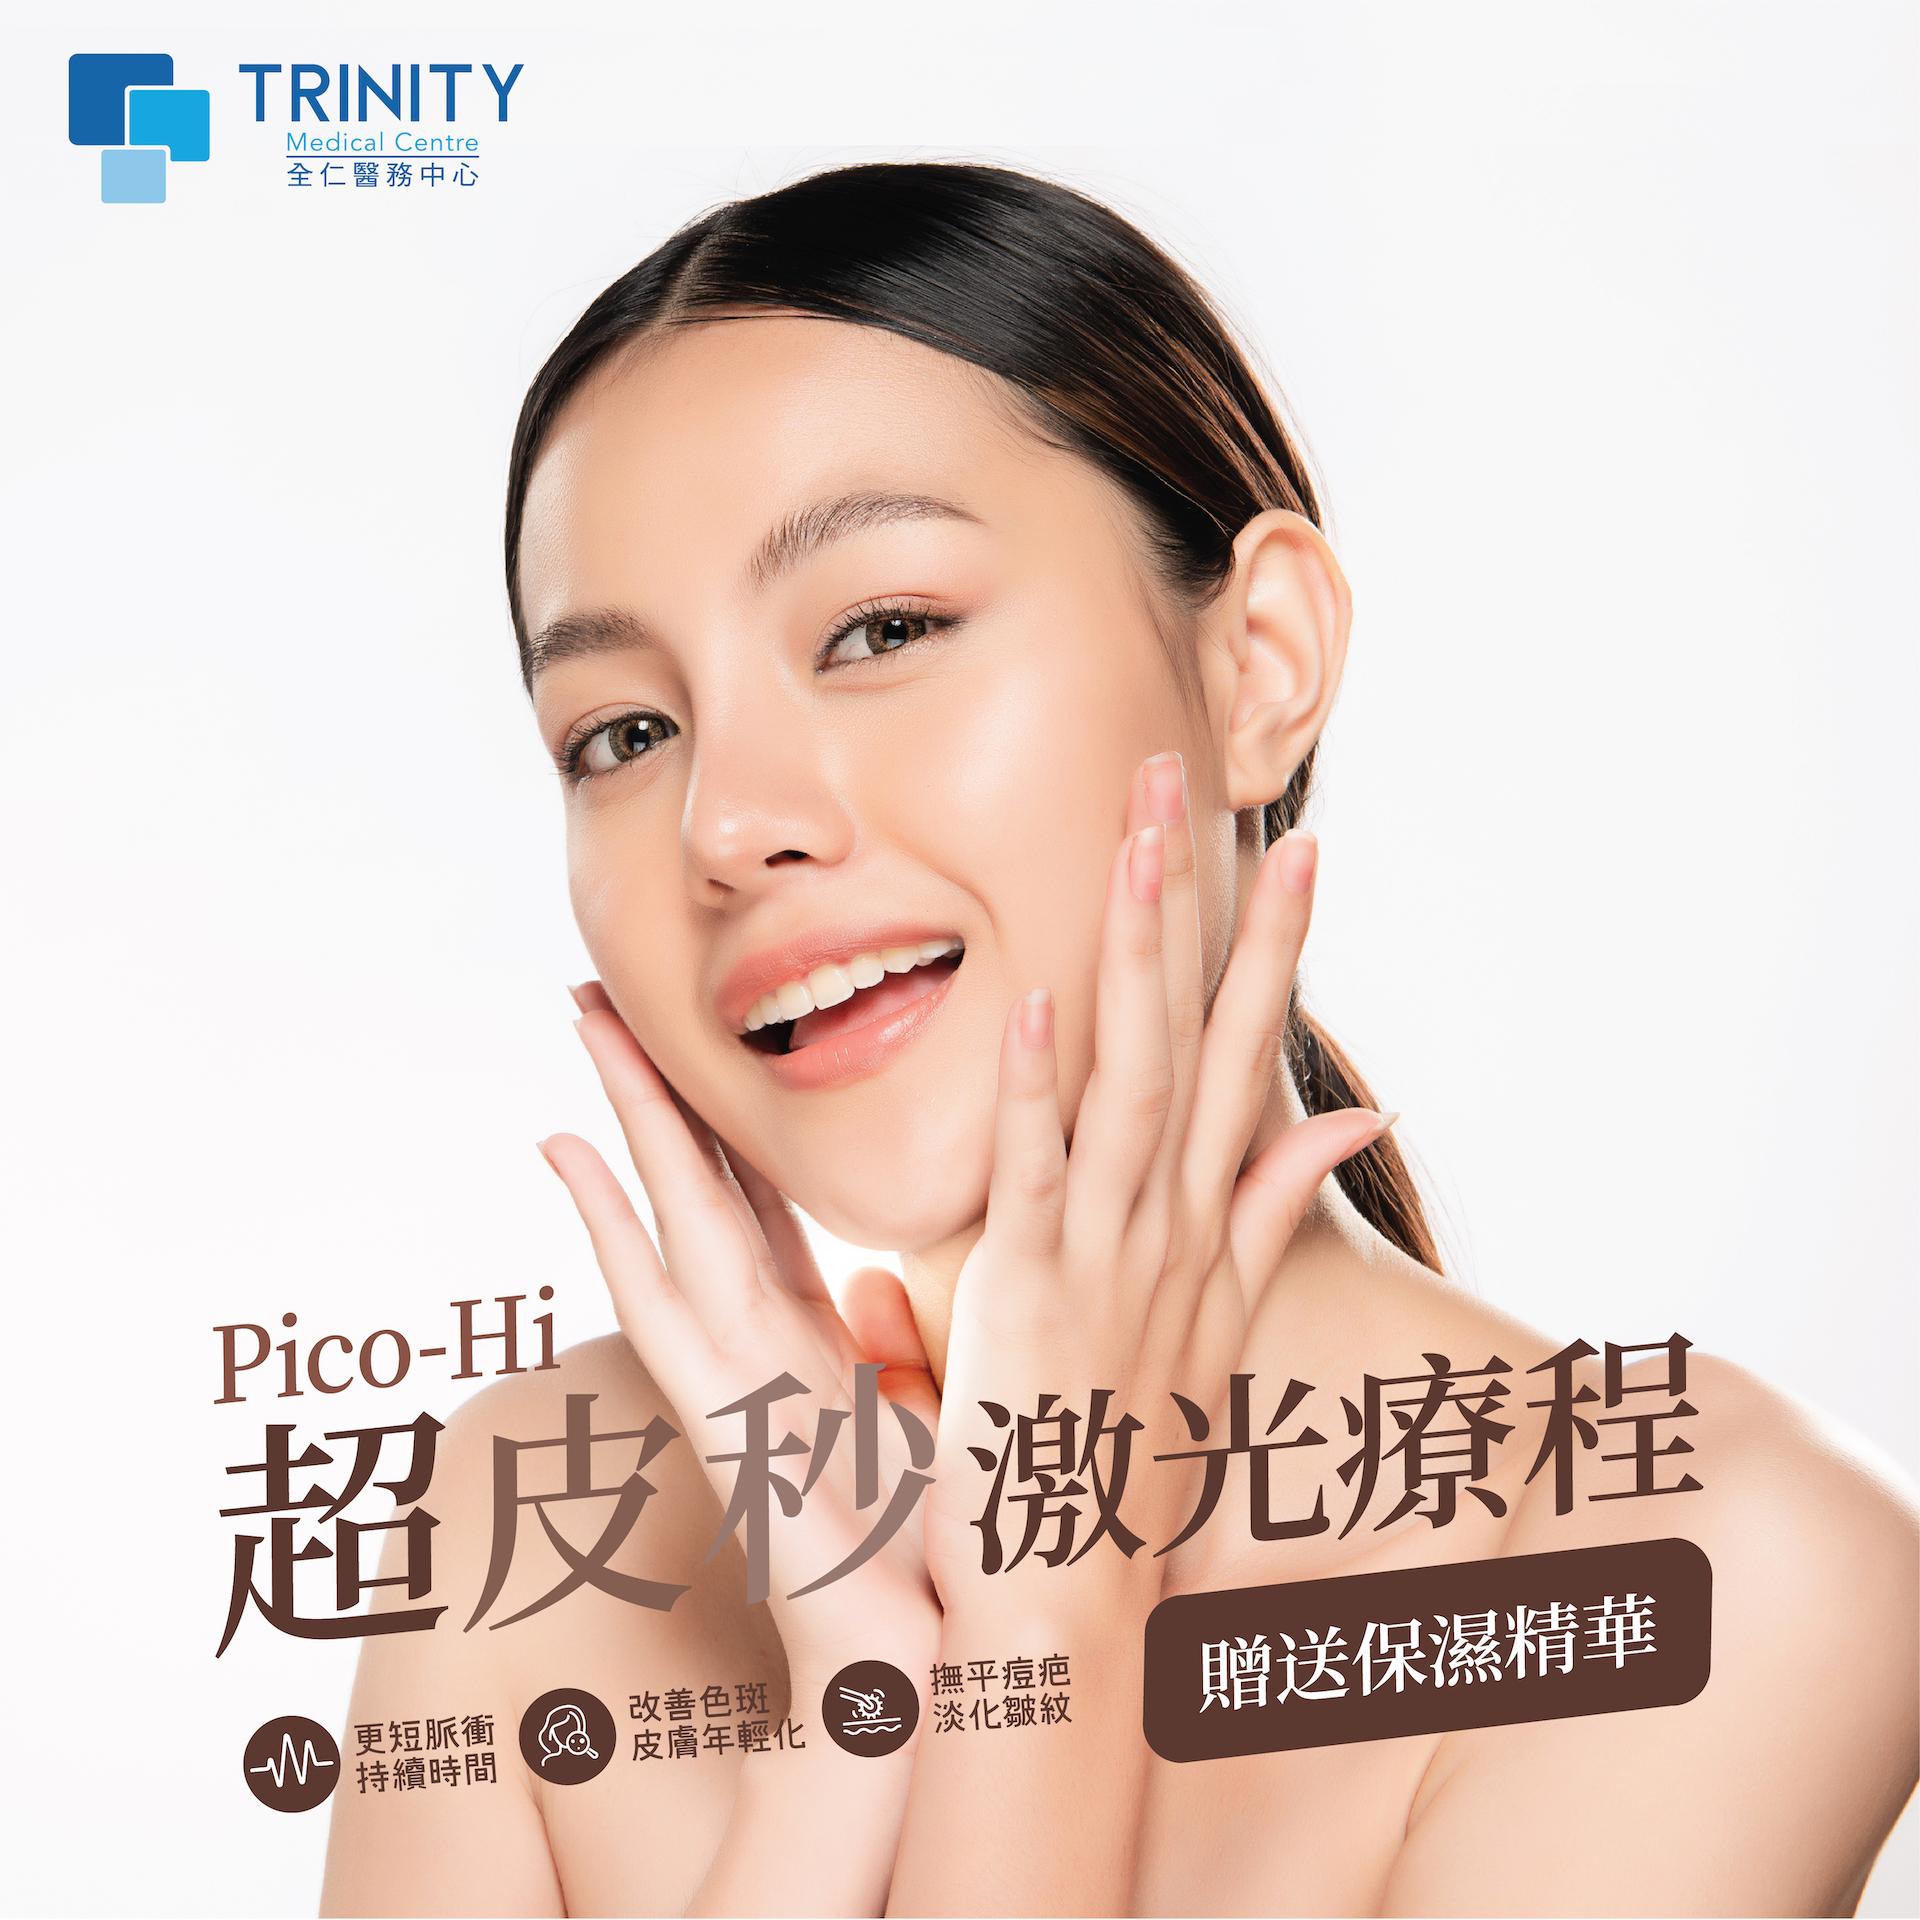 Picohi Treatment